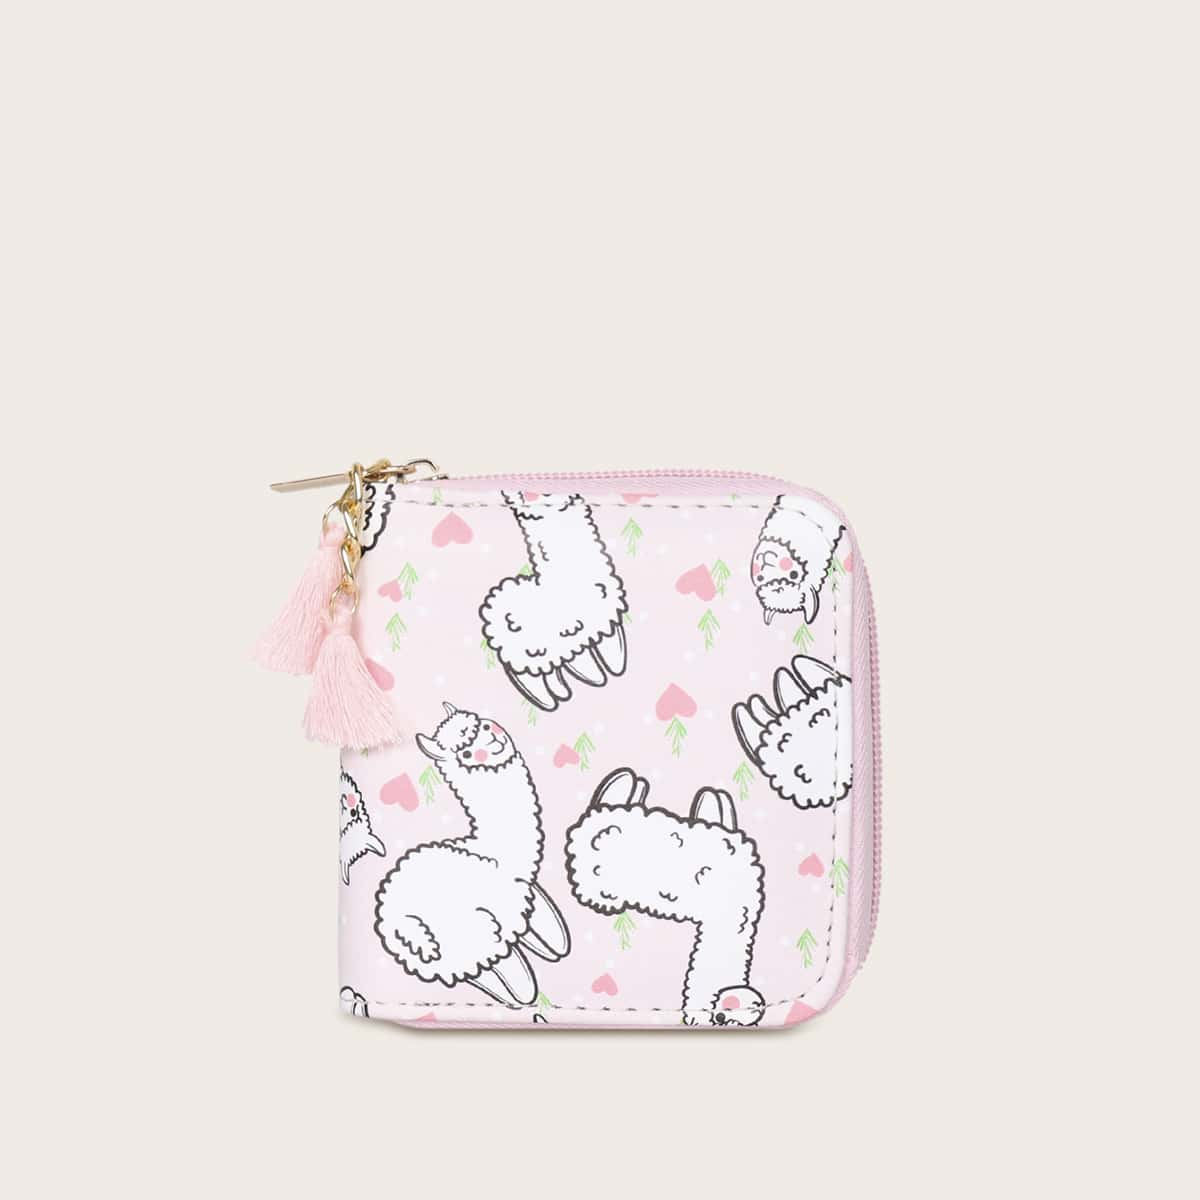 Meisjes alpaca motief omzoomd decoratieve tas